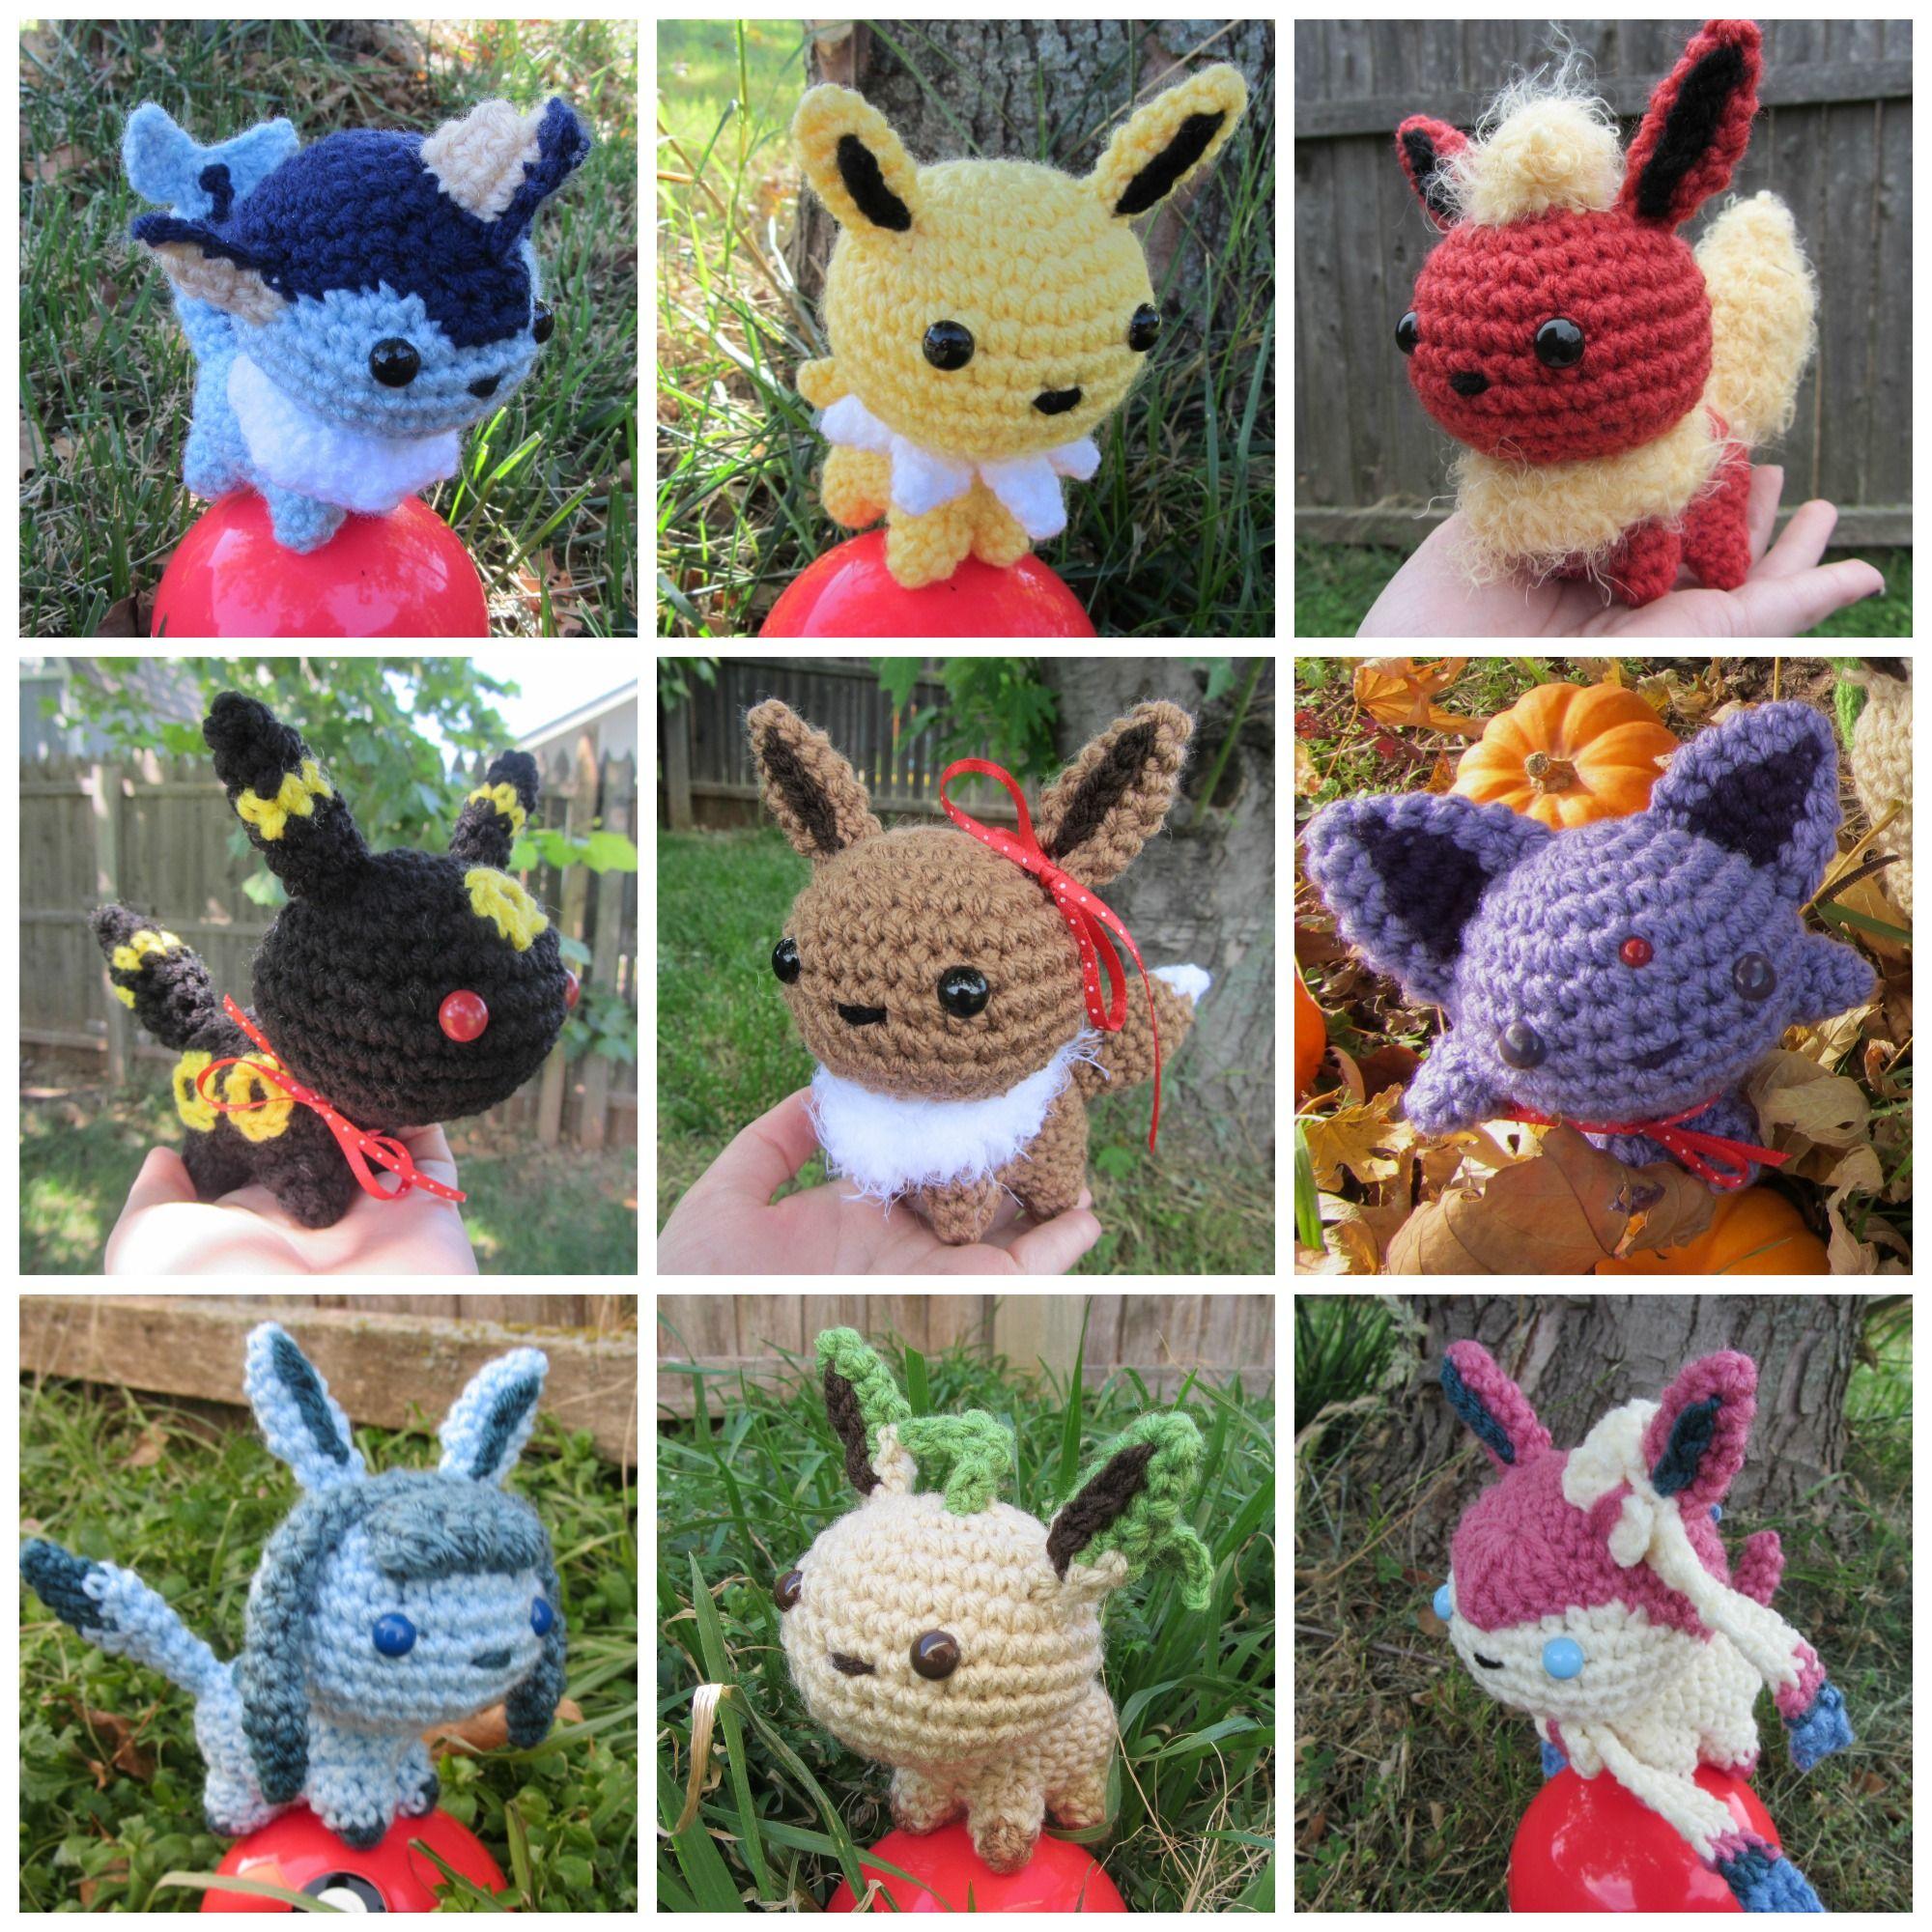 Chibi Pokedex Project by Savannah Mitchell | Pokemon Crochet ...